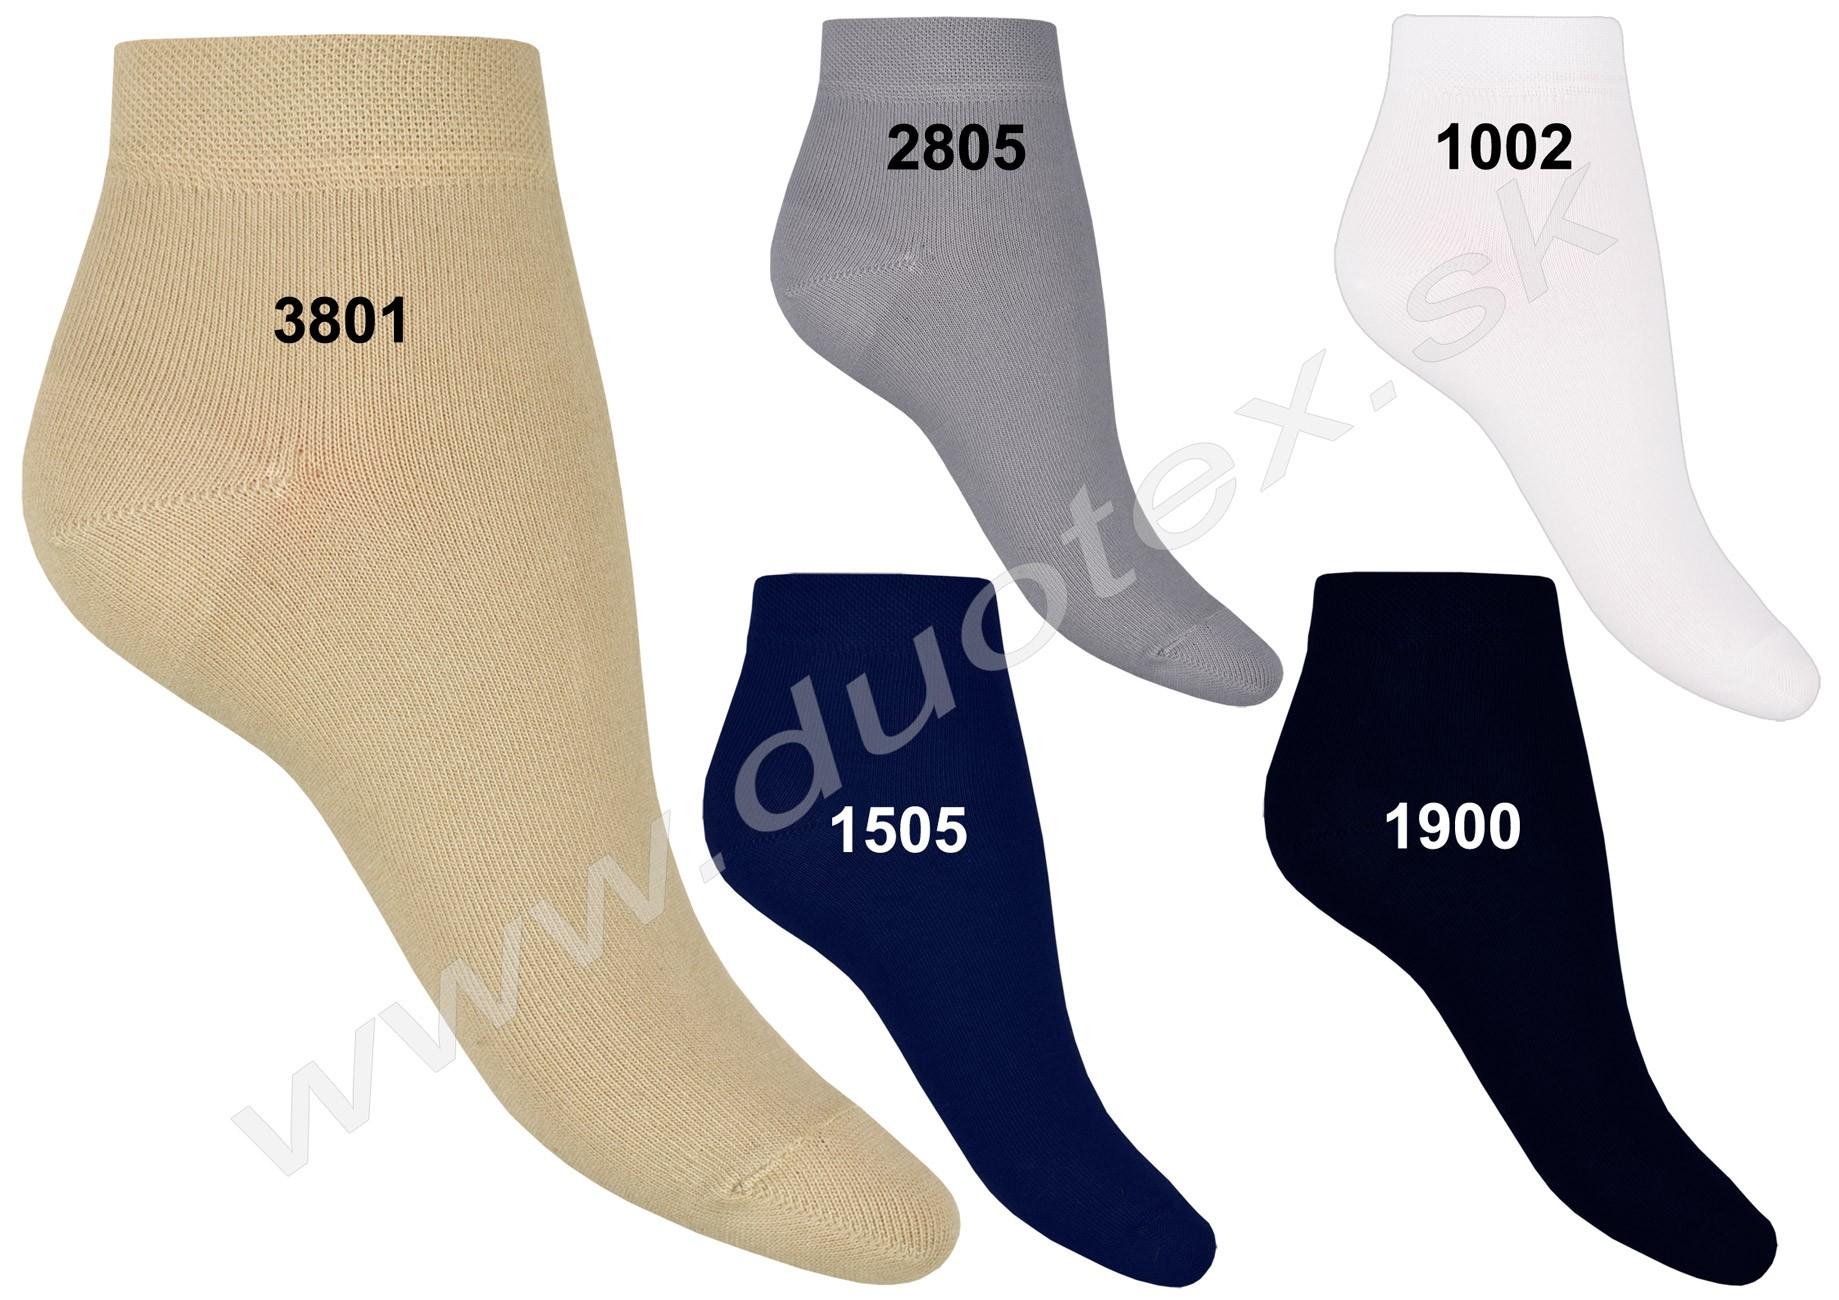 Bavlnené ponožky Palona